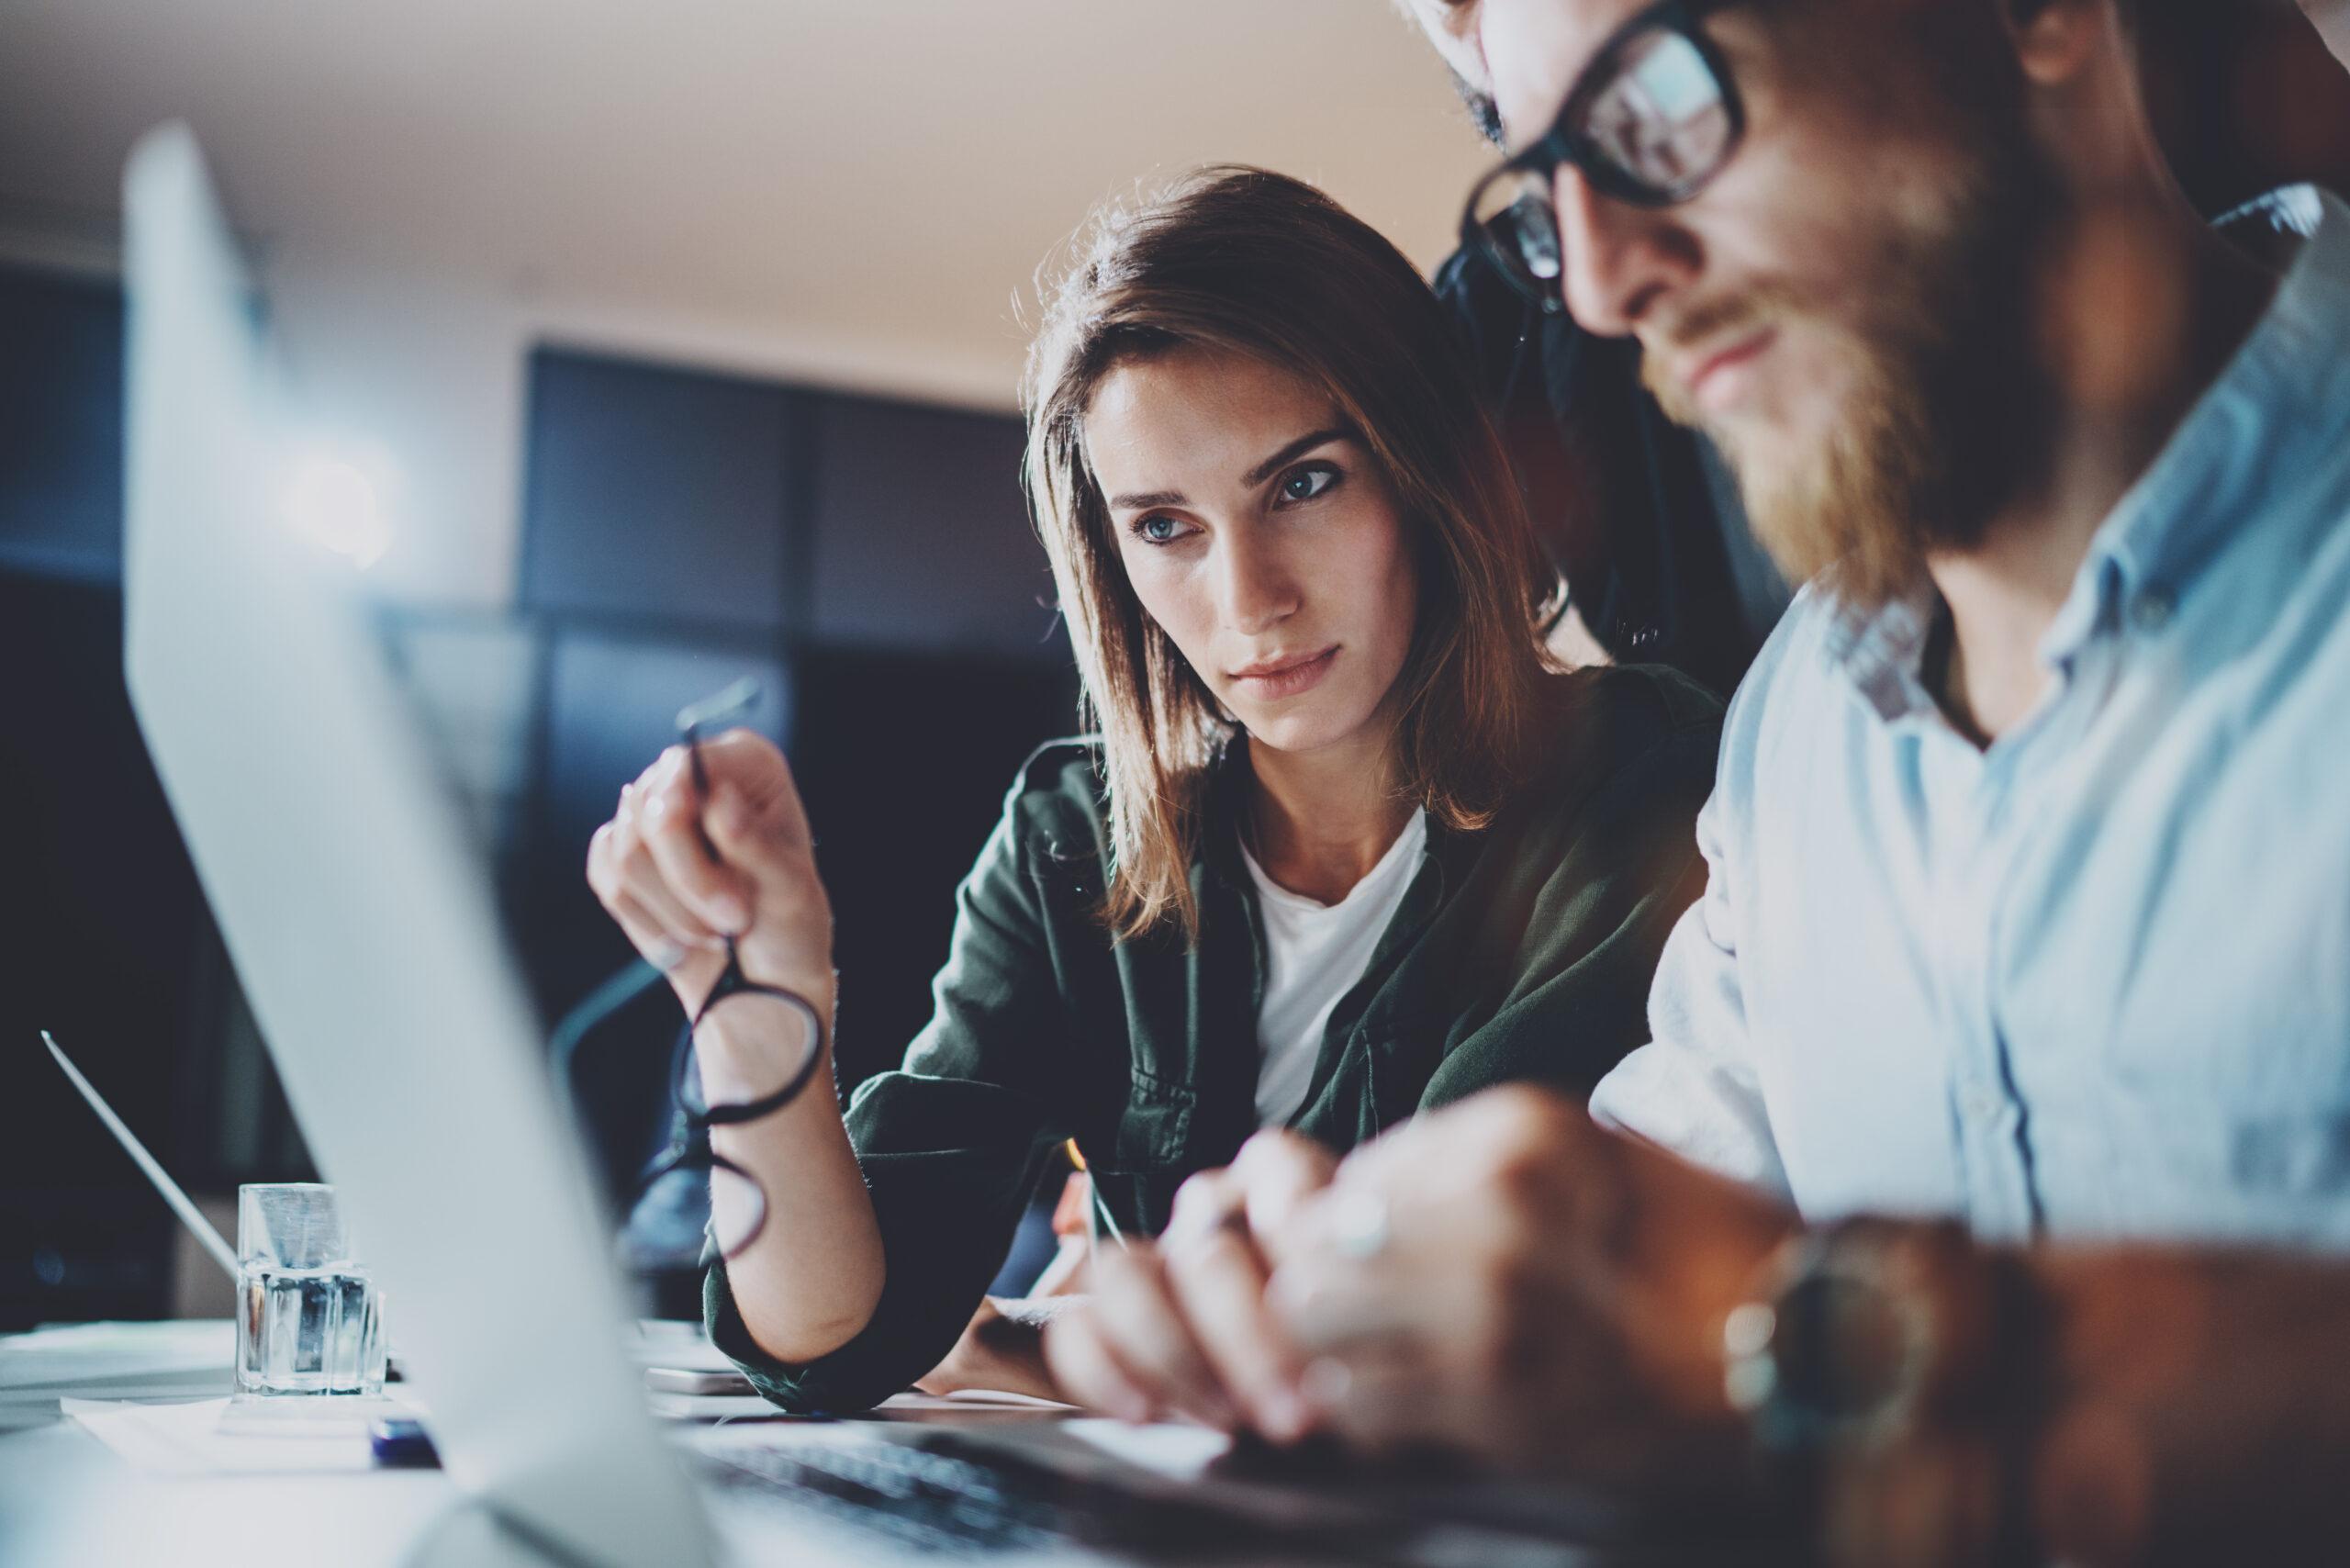 Man and Woman Sitting at Desk, Looking at Laptop Computer